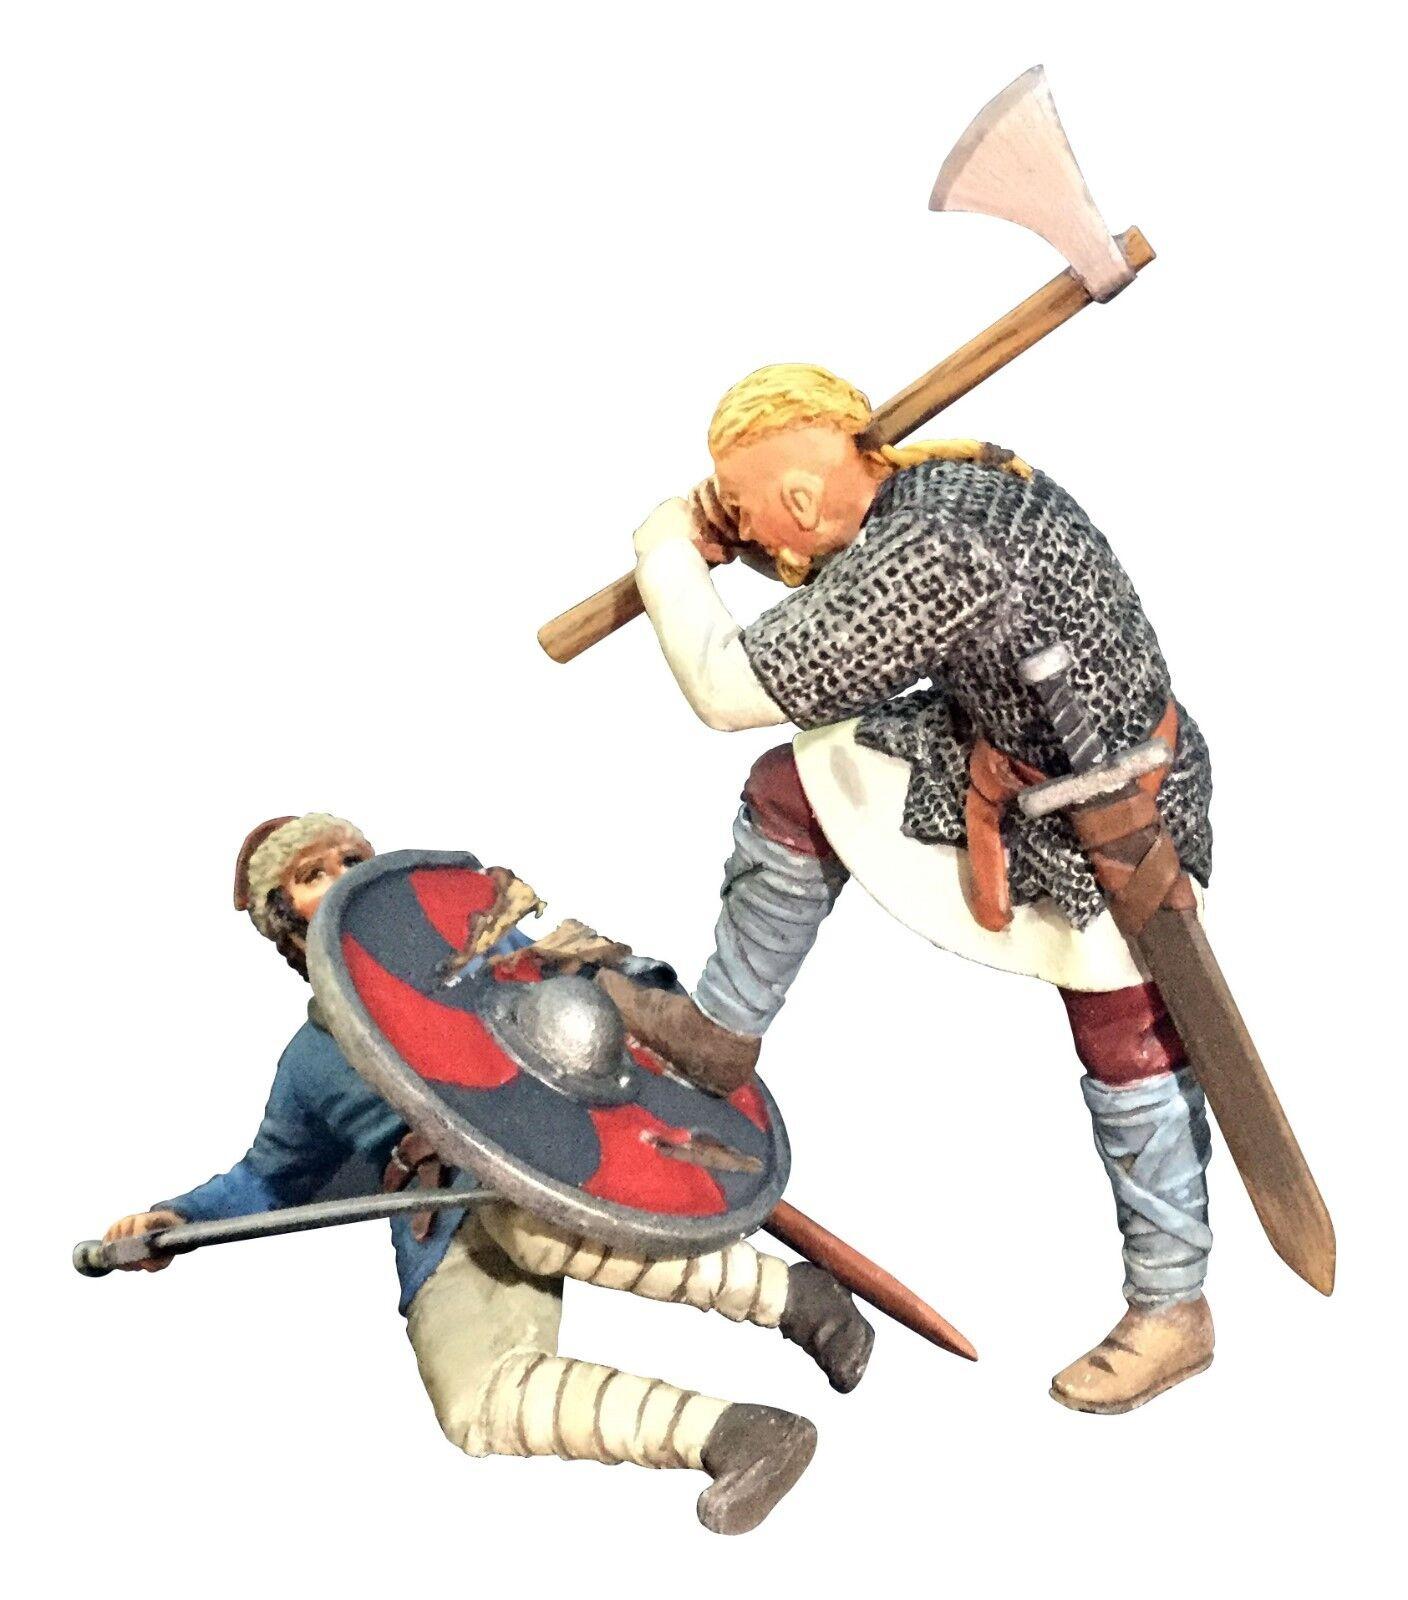 BRITAINS SOLDIER 62122 - Overwhelmed Viking Striking Downed Saxon